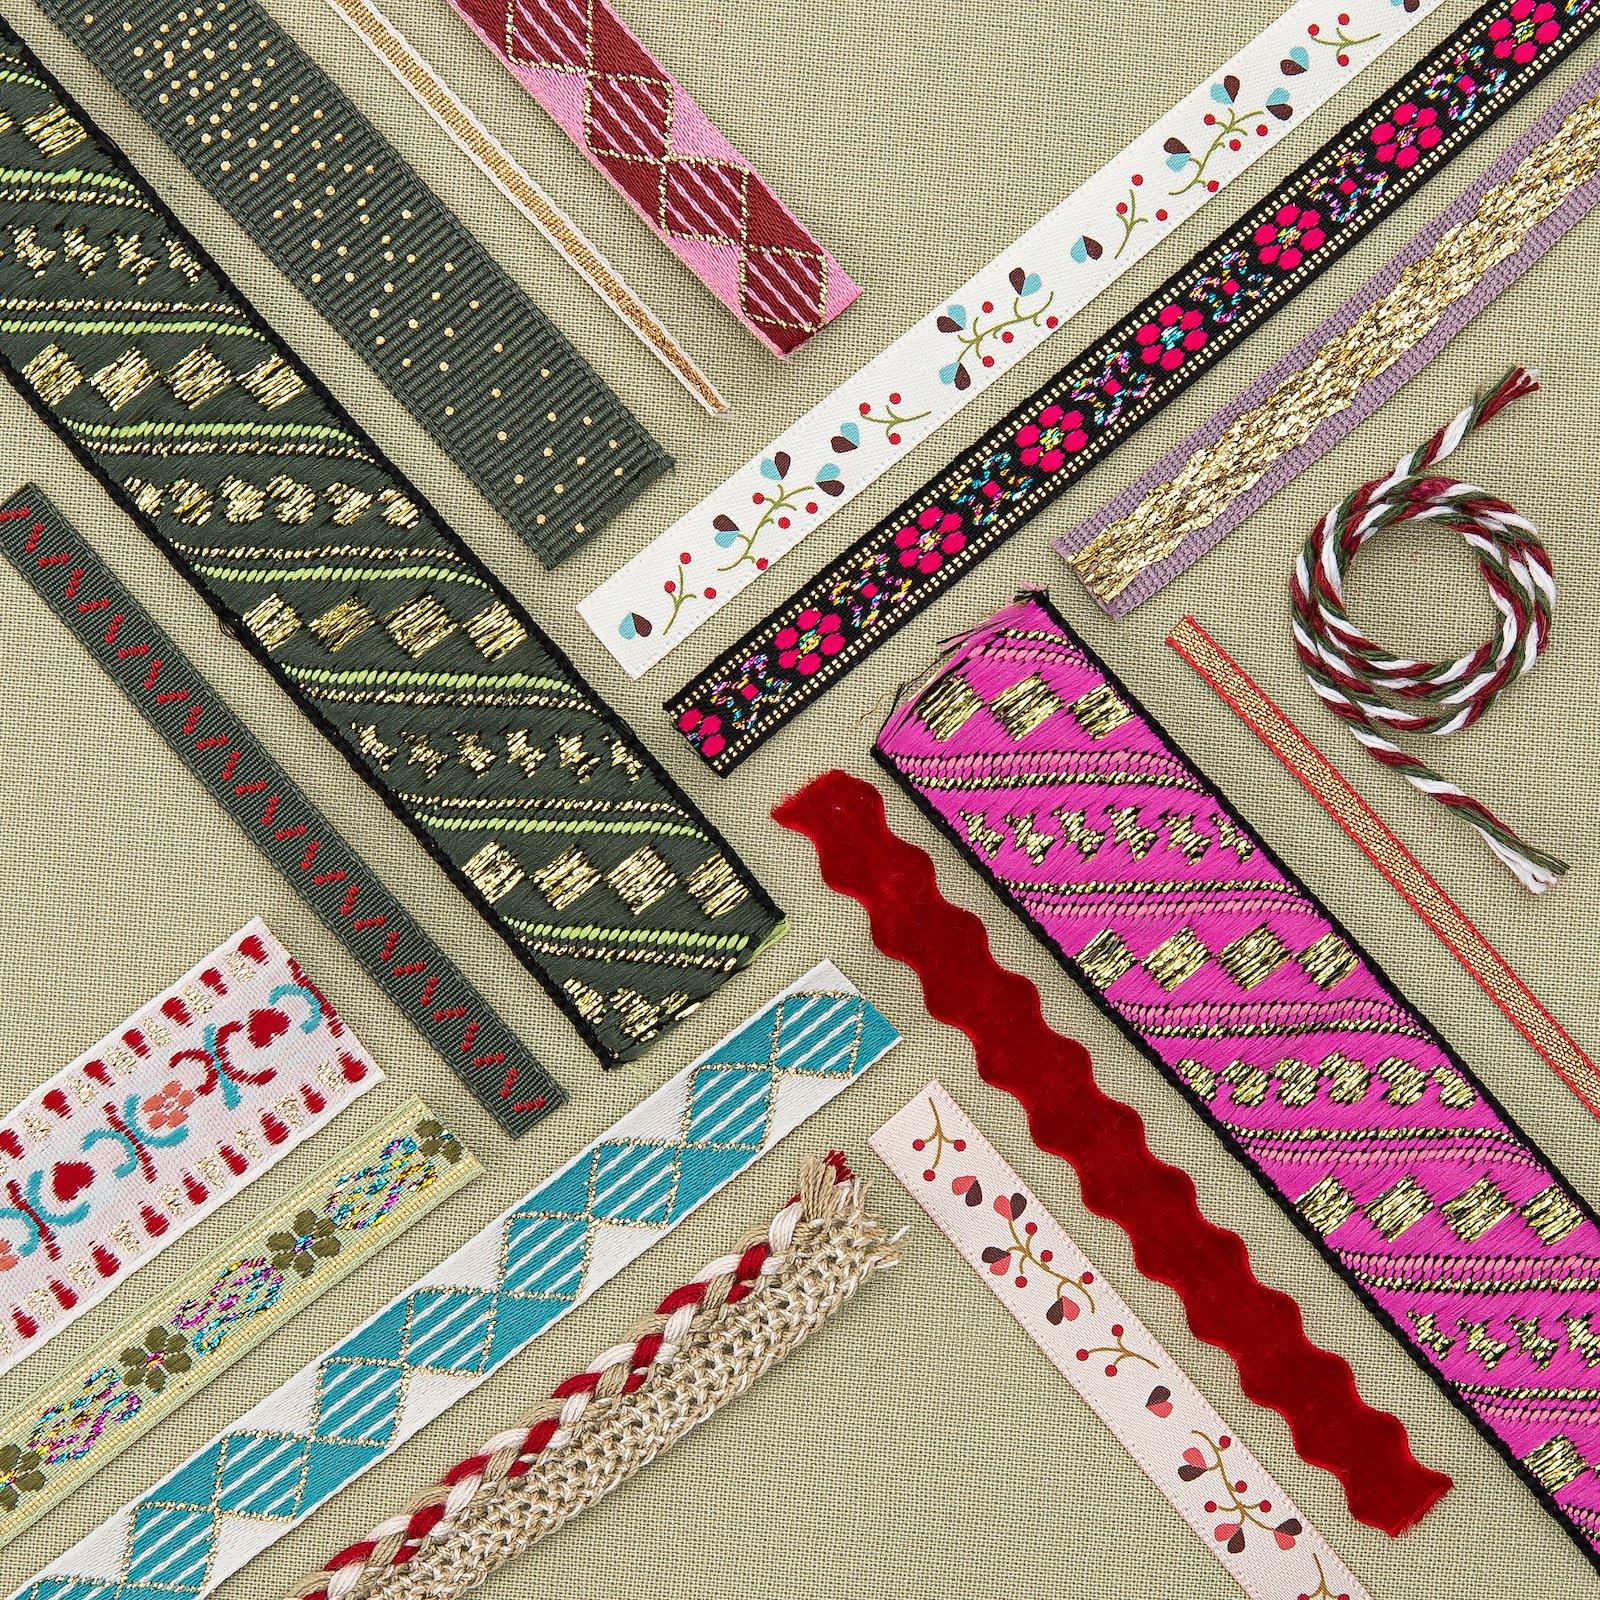 Ribbon woven 10mm light heather 3m 22360_22268_22365_22287_22368_21437_22334_22234_22335_22213_22267_22255_22362_22367_22358_bundle